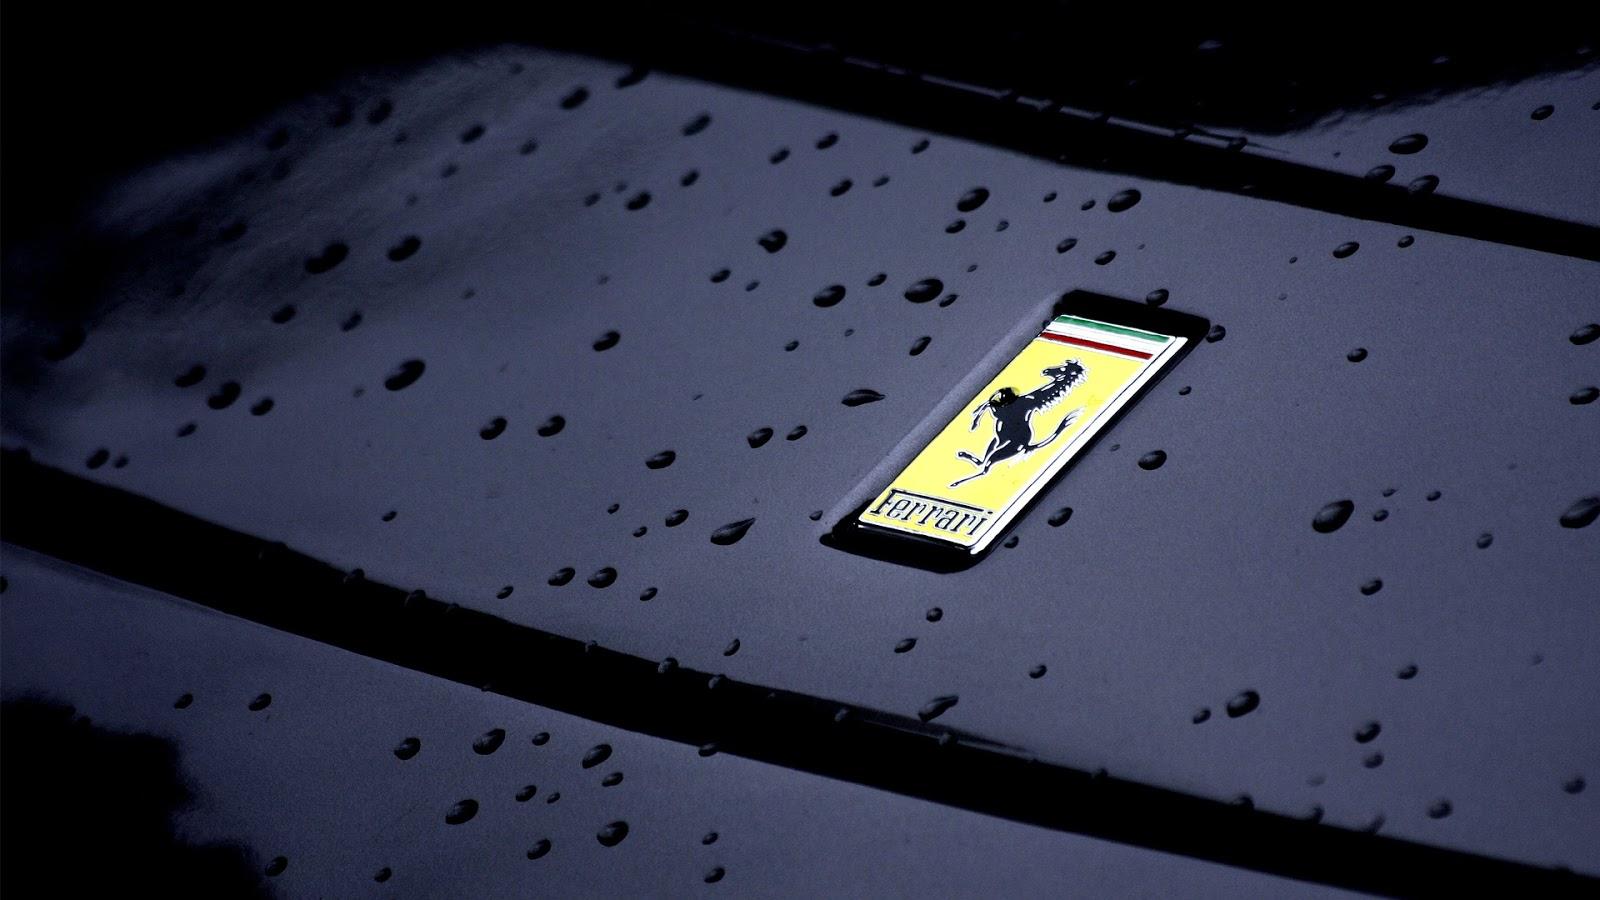 Ferrari Logo Hd Wallpaper Likegrass Free Download Wallpapers For Iphone Car